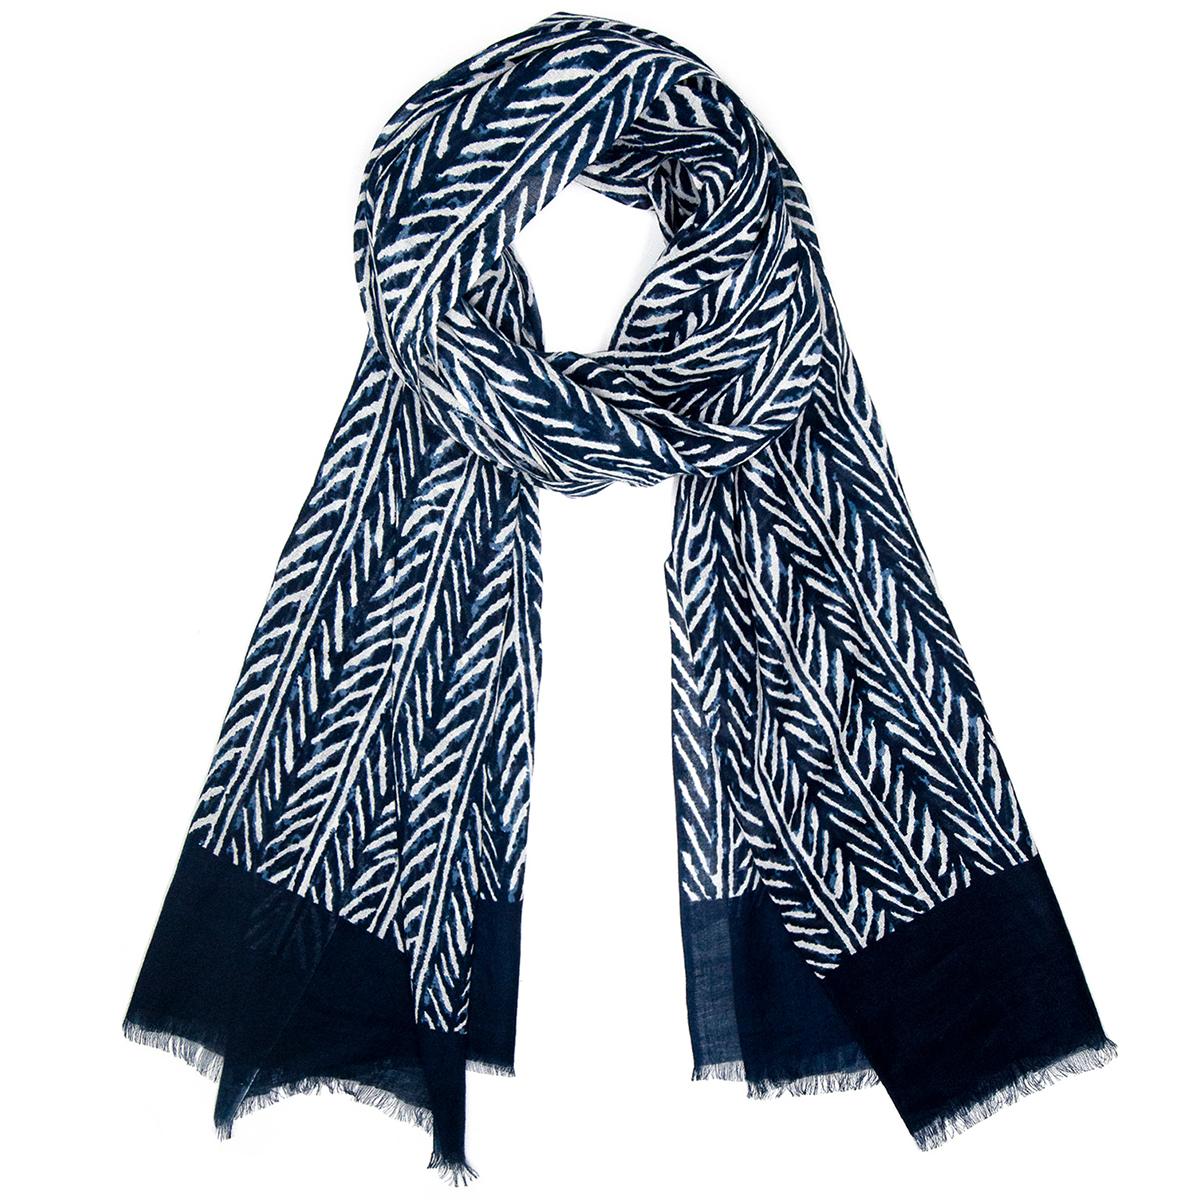 Indigo herringbone cotton scarf